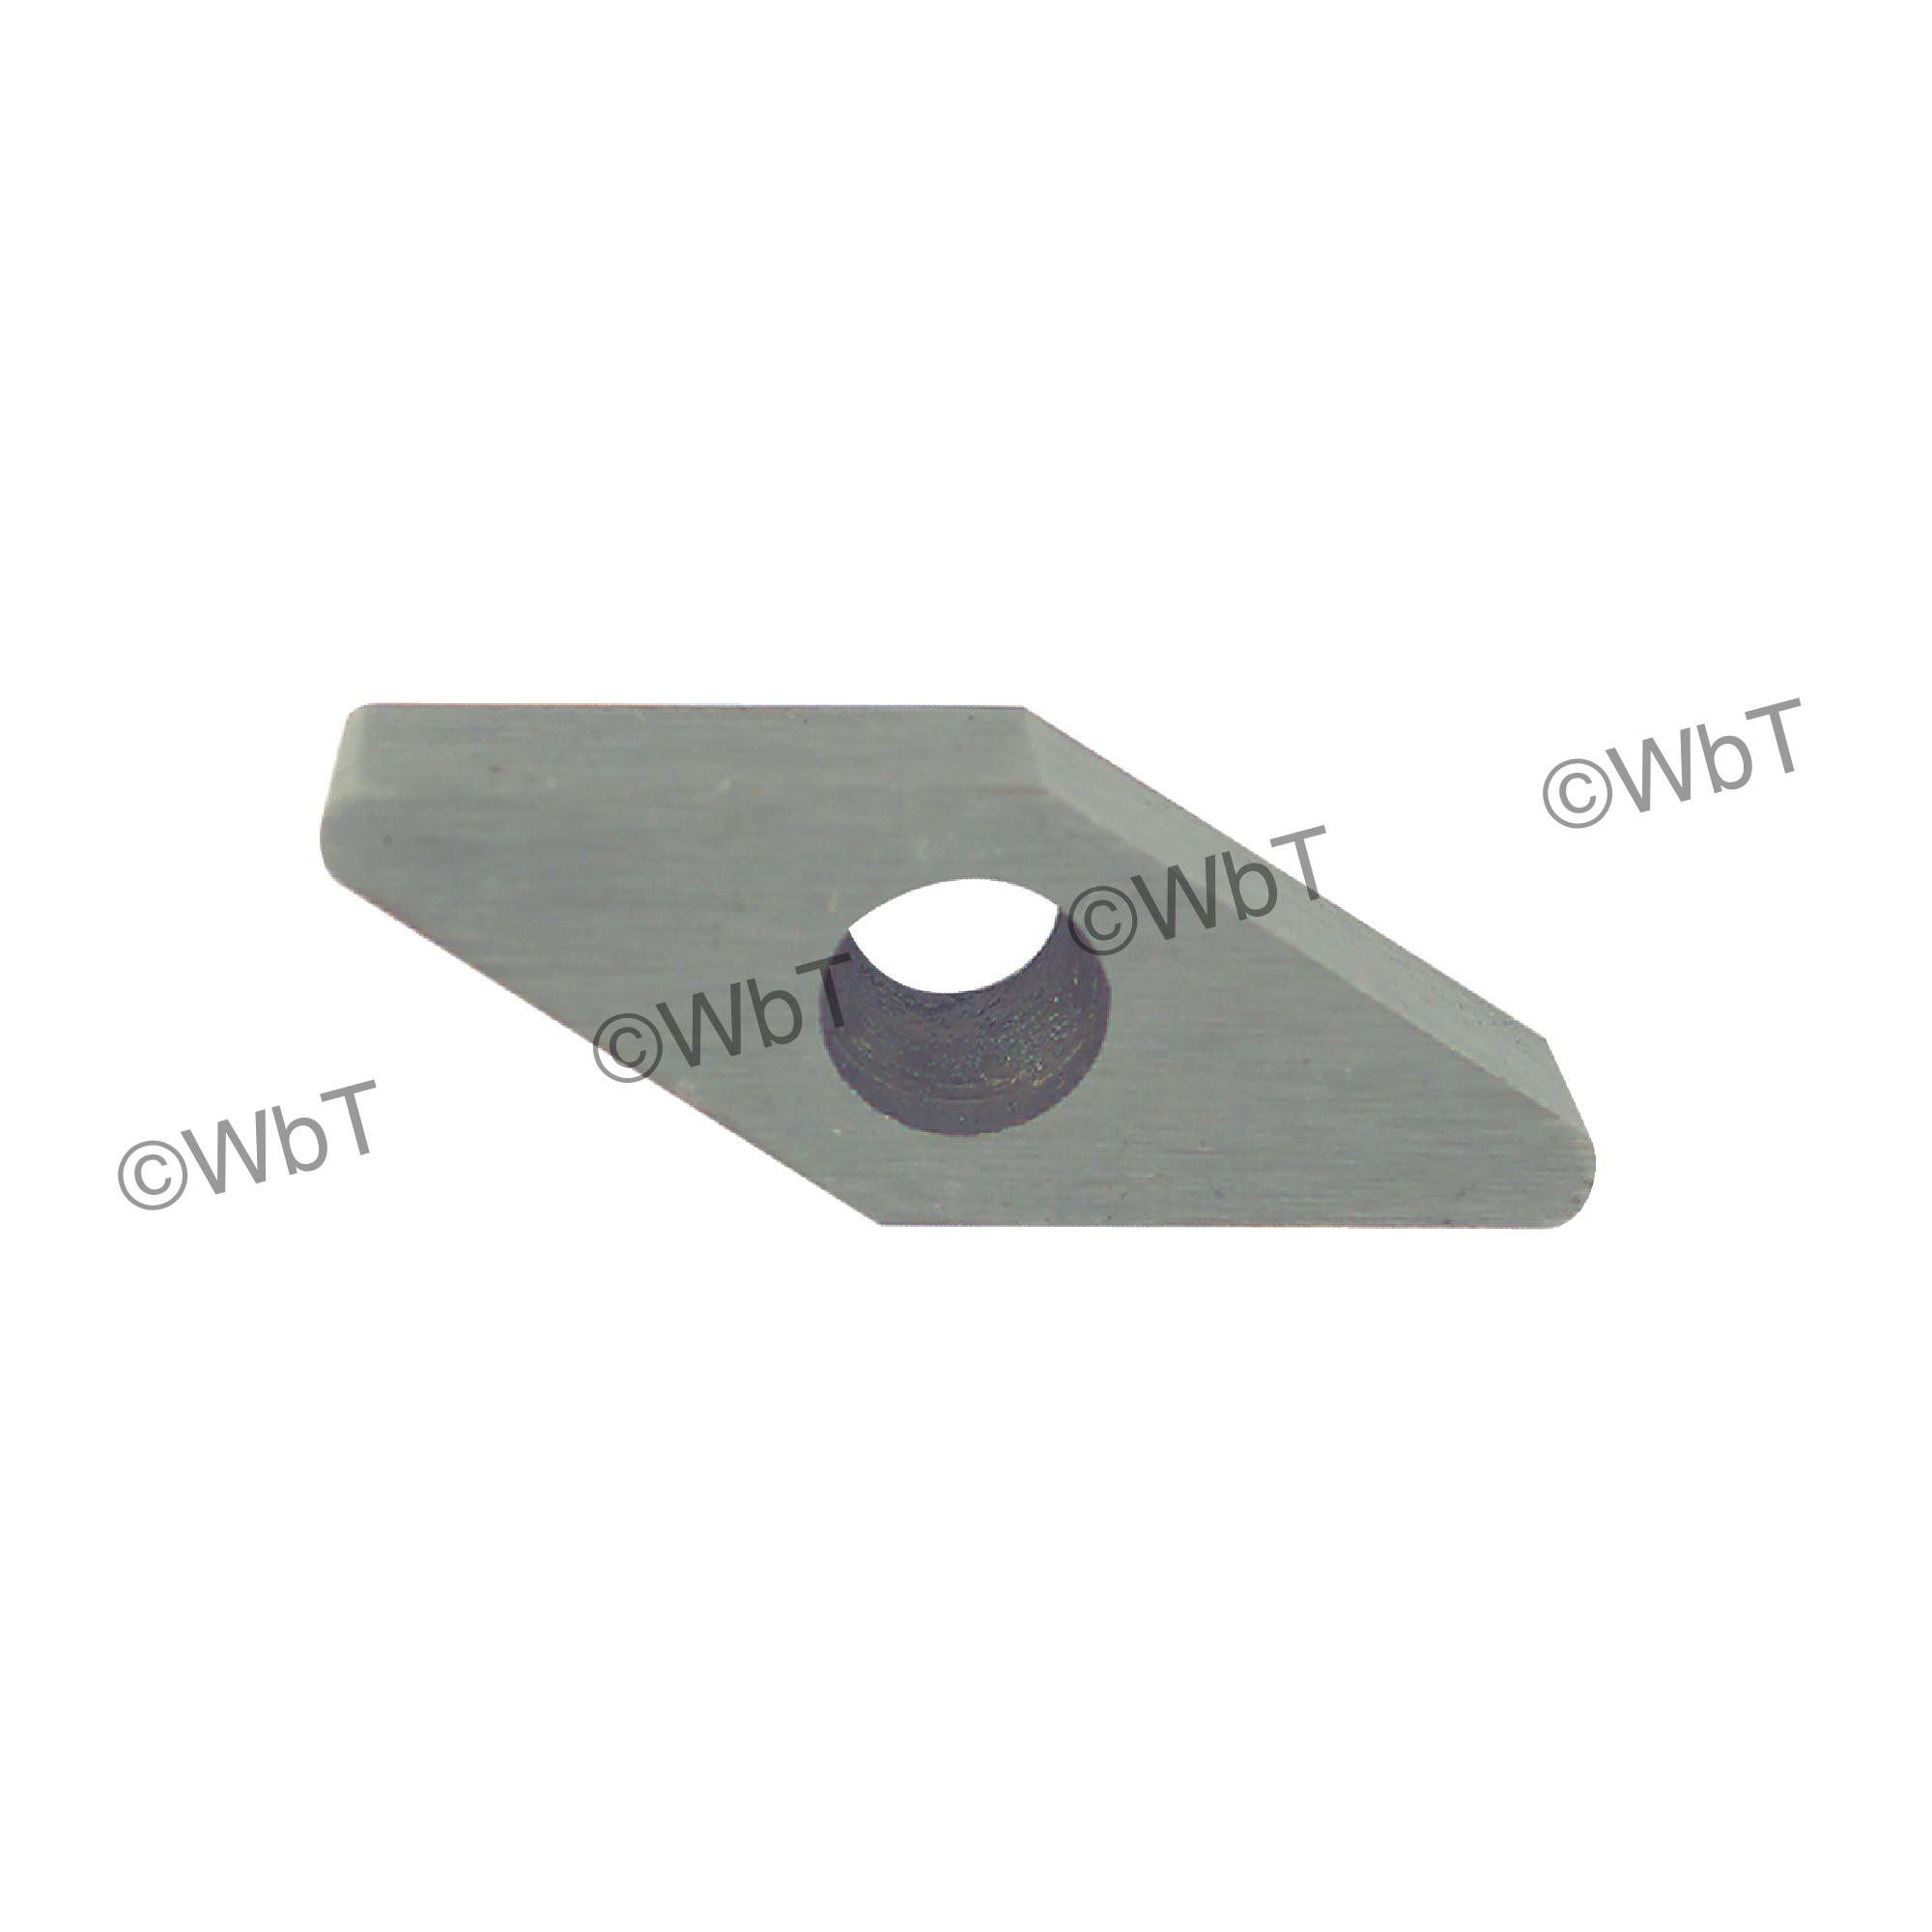 TTC PRODUCTION - VCMW221 HSS - 35° Diamond / Indexable HSS - High Speed Steel Turning Insert